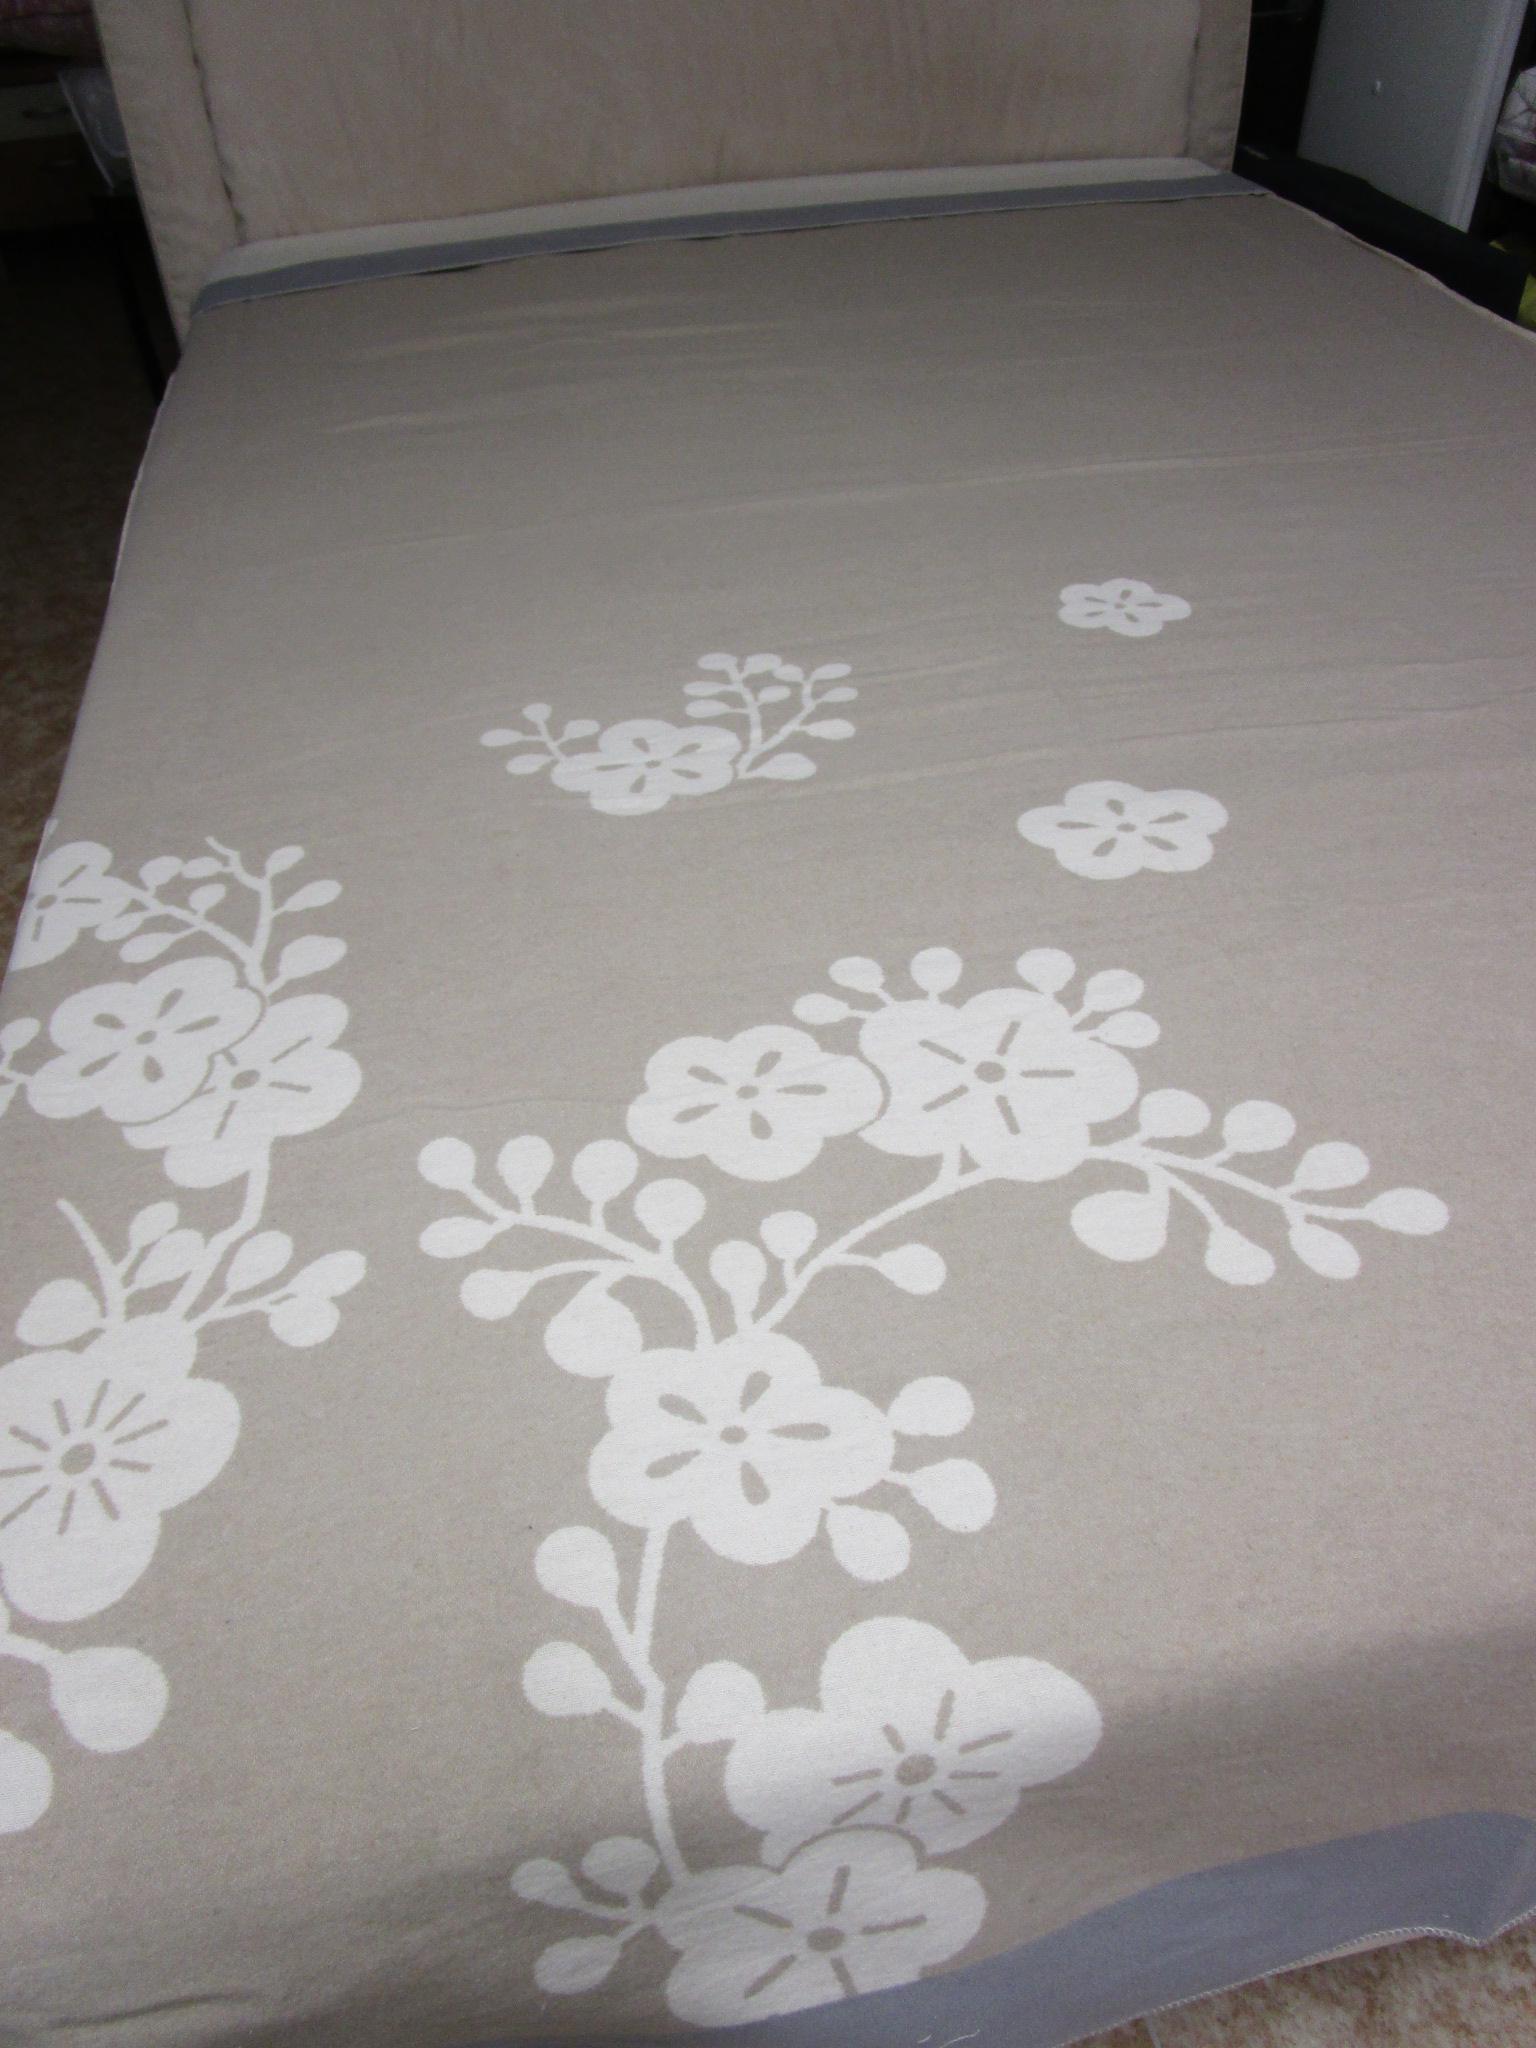 Tagesdecke 240x220 Cm Uberwurf 1 B Ware Fur Ein Doppelbett Floral